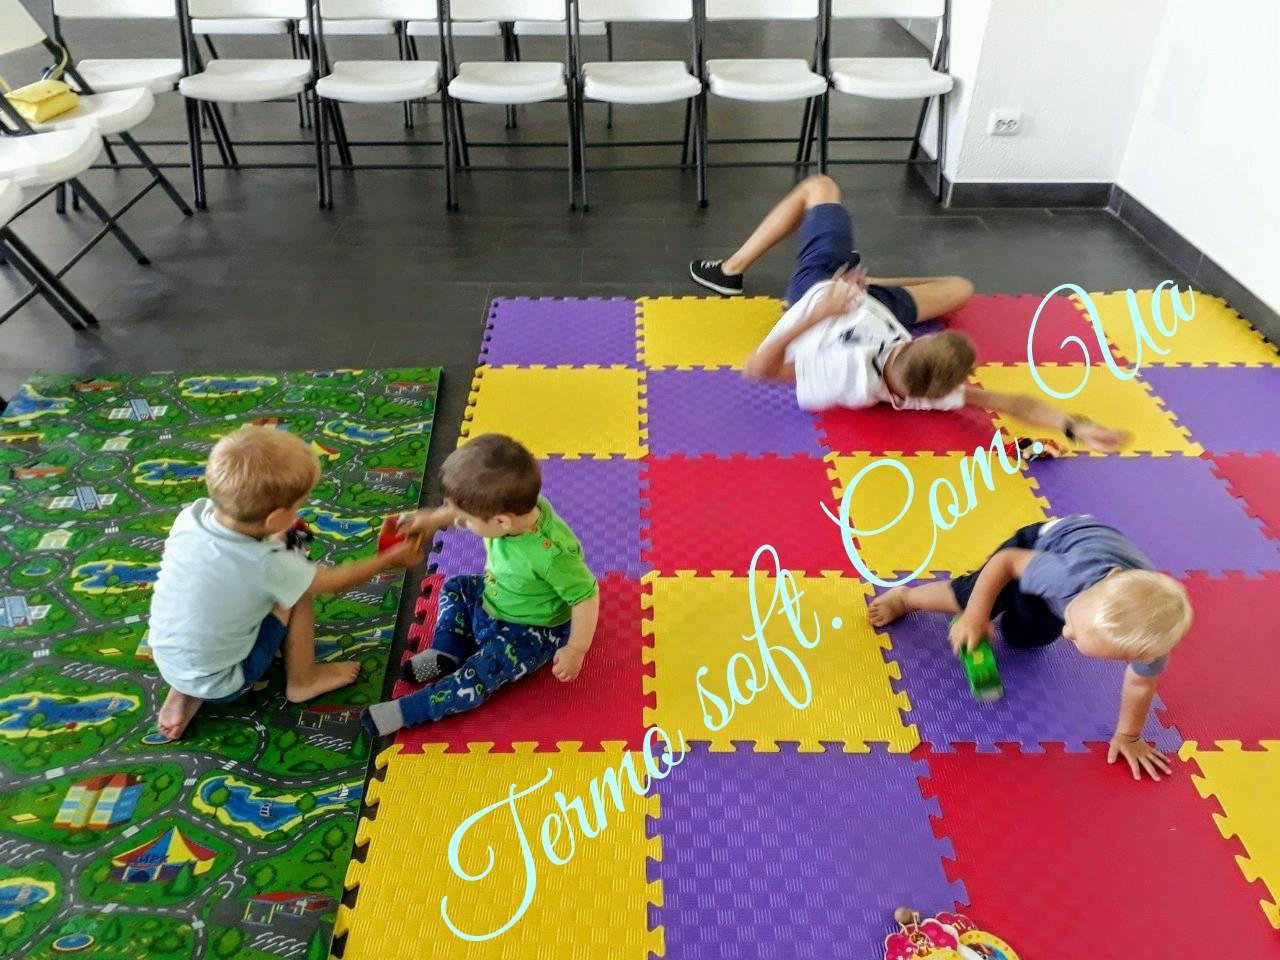 Коврик-пазл (мягкий пол) для детских комнат и спортивных залов, 50х50х1см